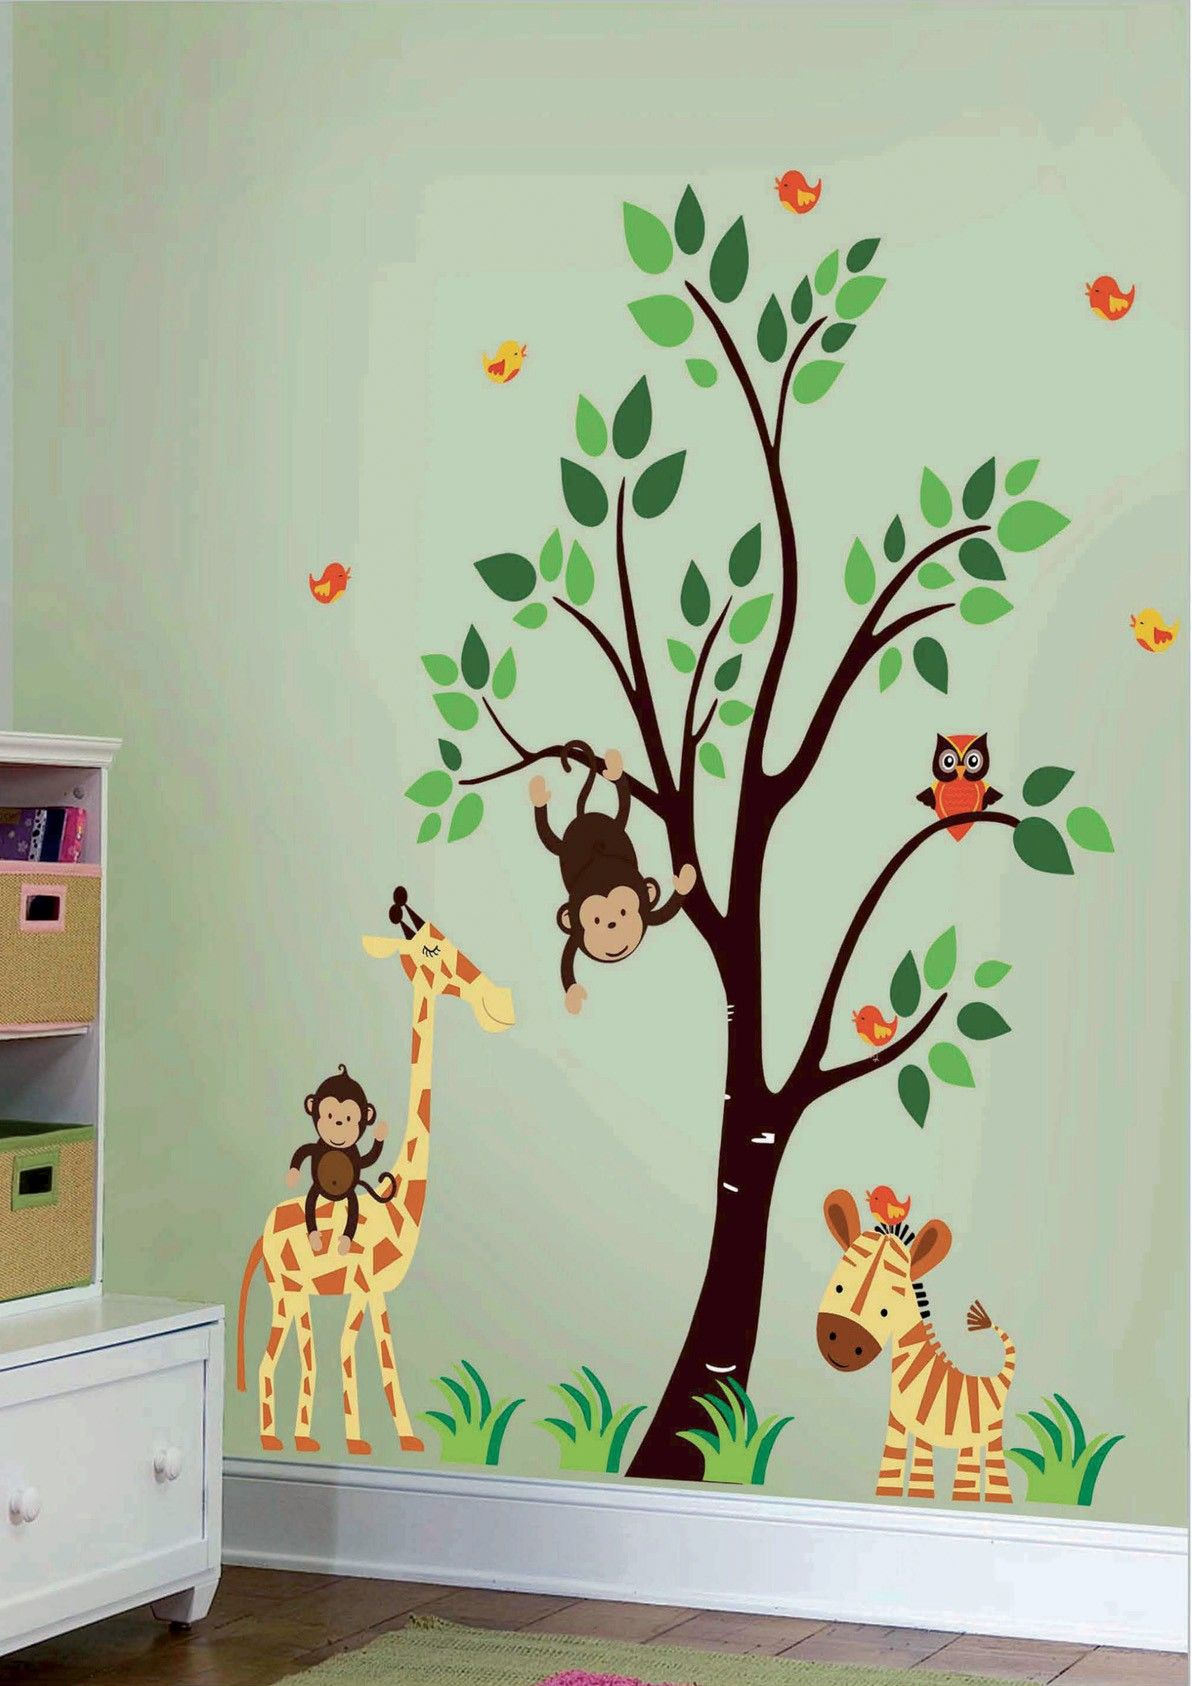 artistic vinyl blik mural wall sticker jungle family wall decal for kids children and nursery. Black Bedroom Furniture Sets. Home Design Ideas